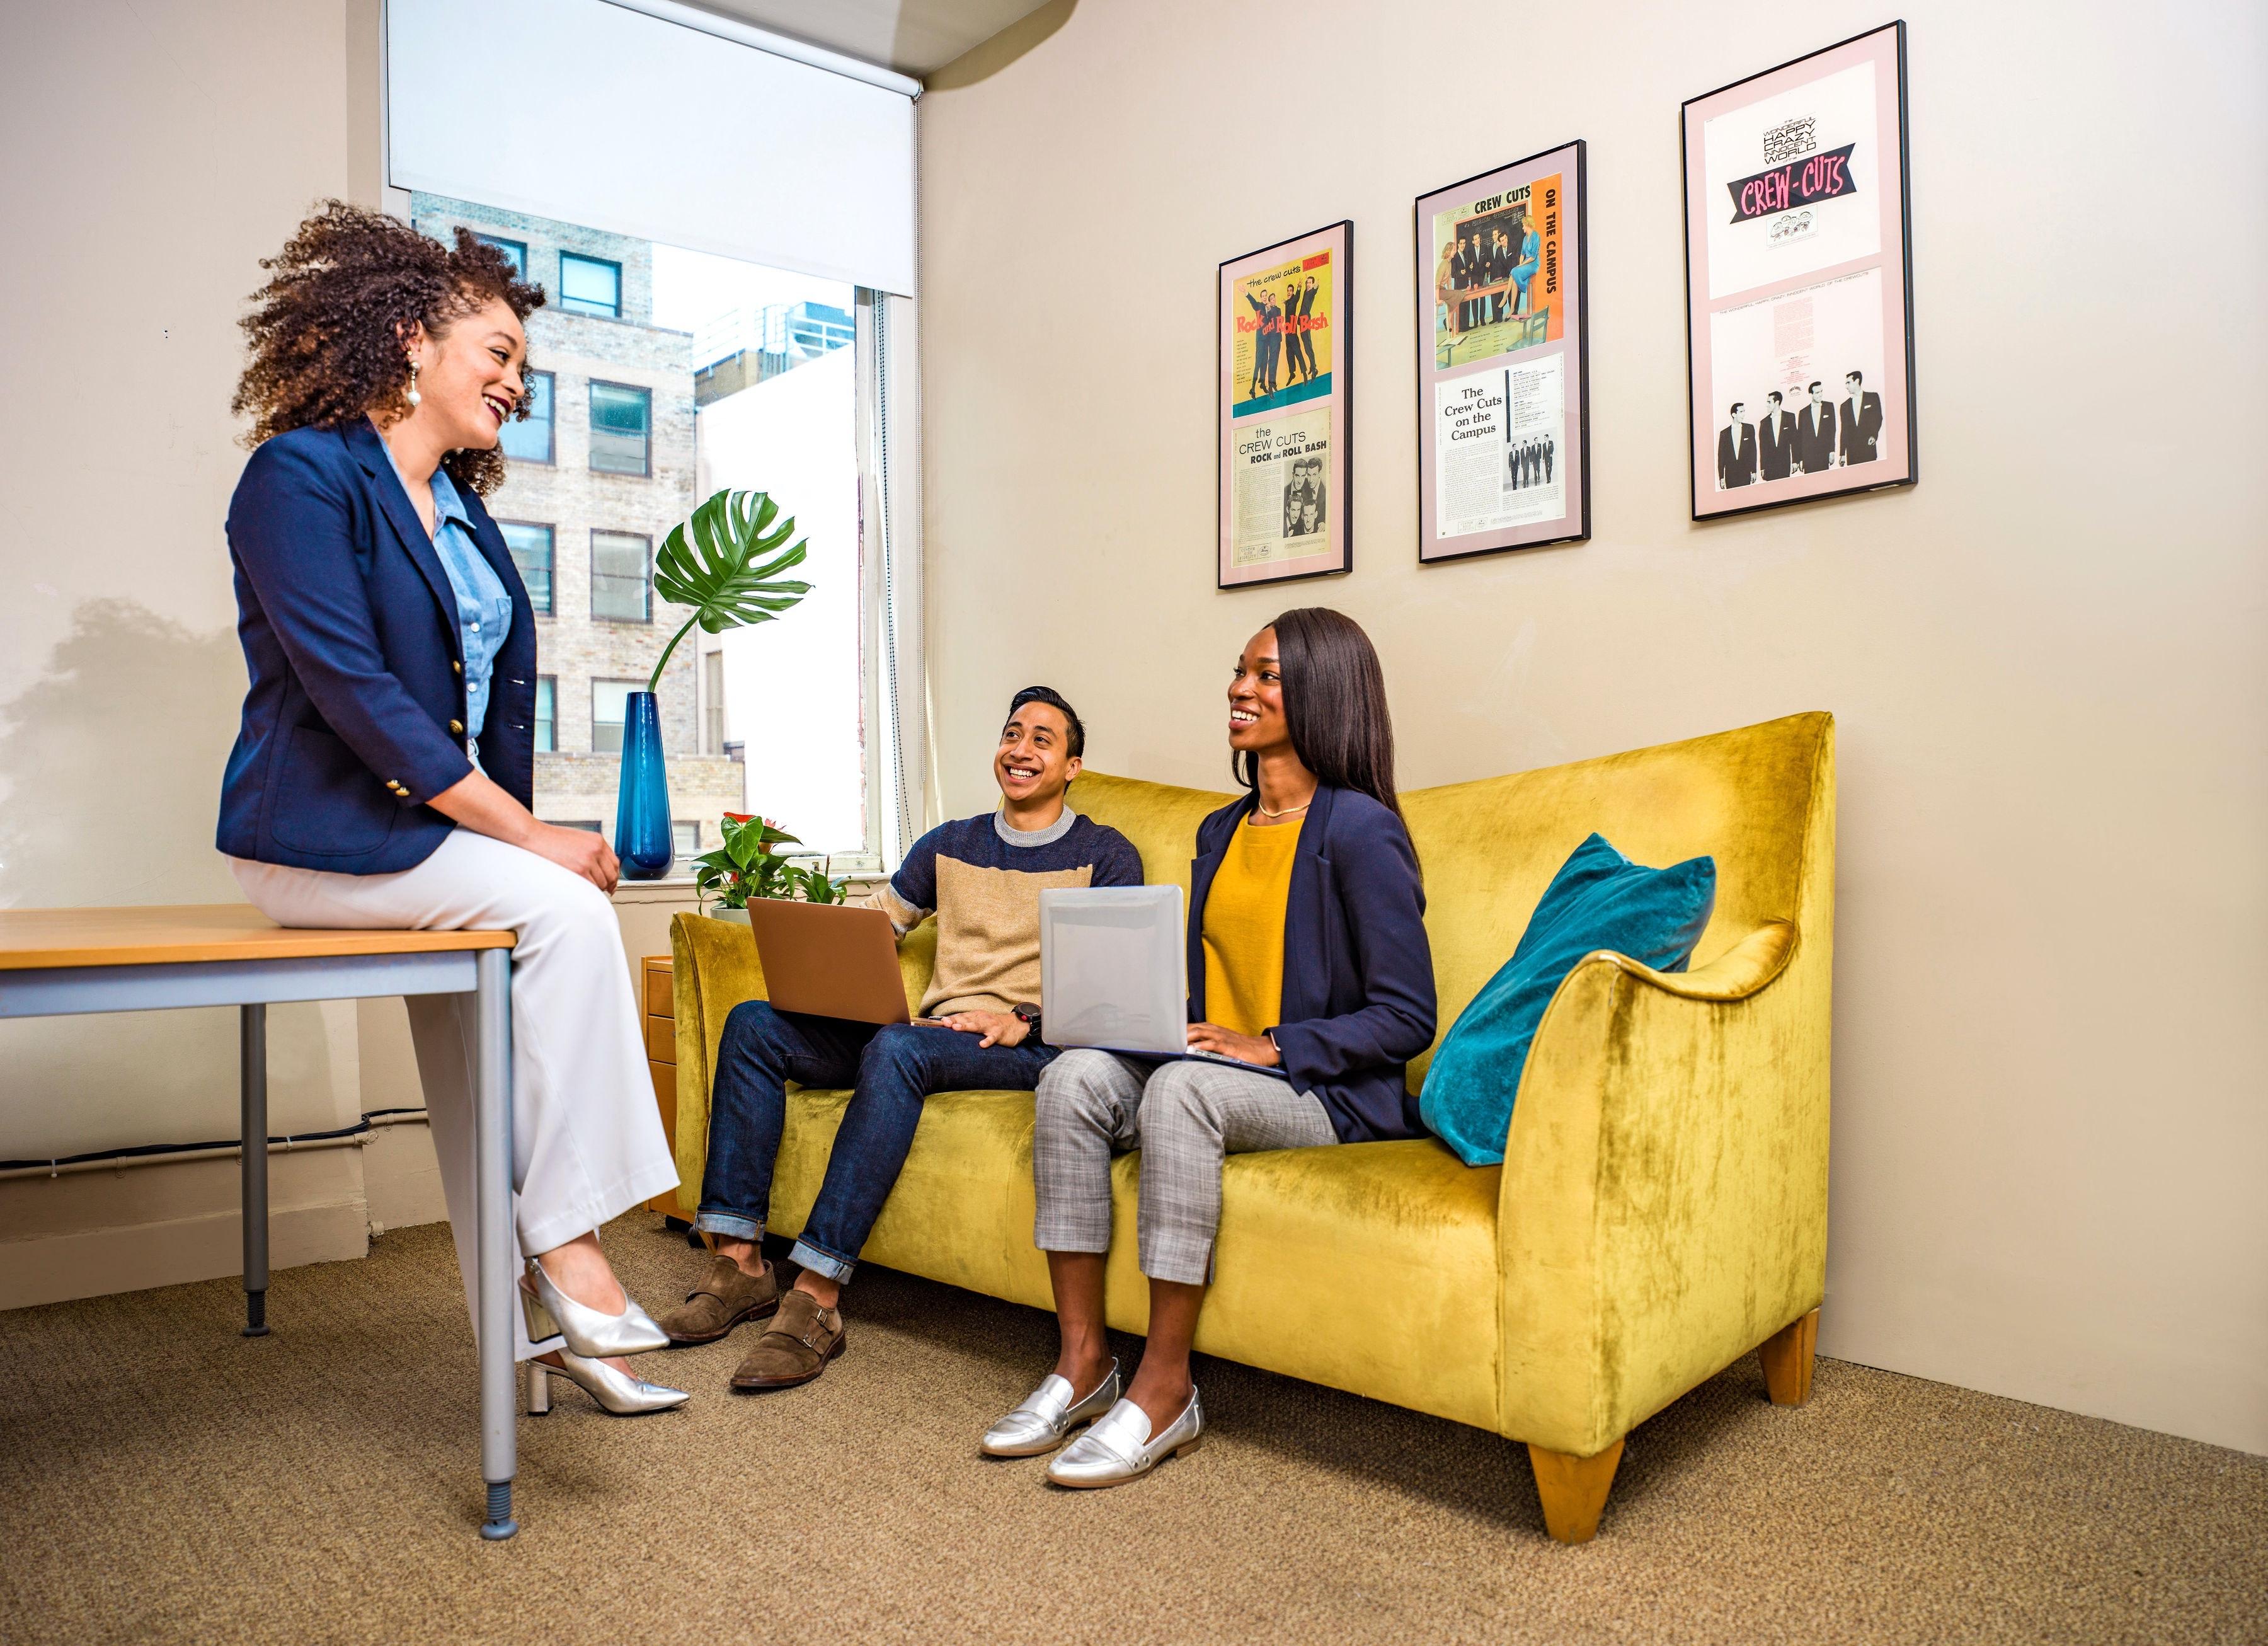 6 Ways to Create a Psychologically Safe Workplace